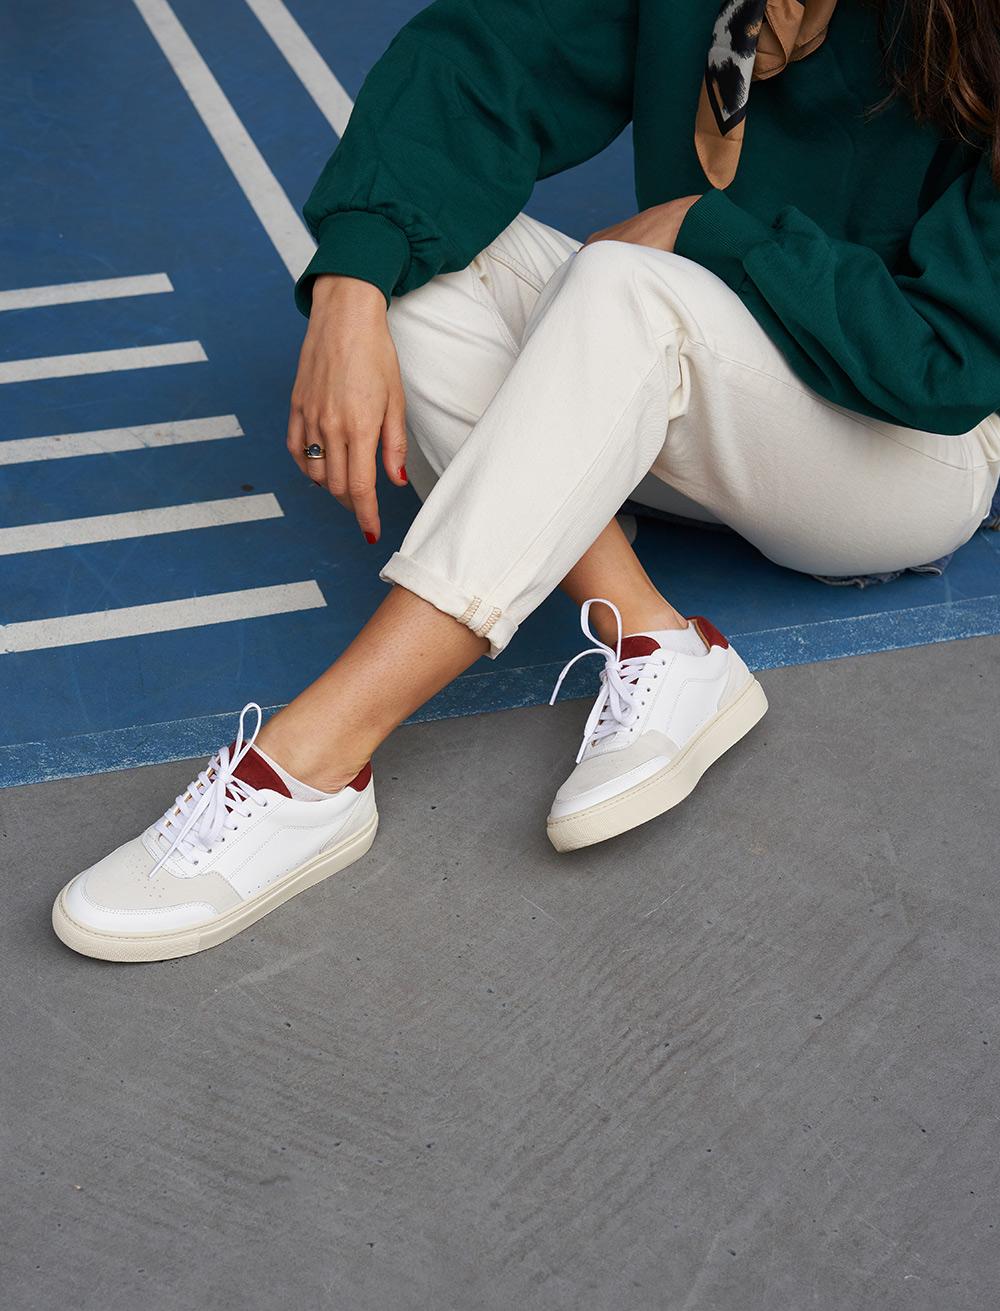 Frisco V3 - White, Rust